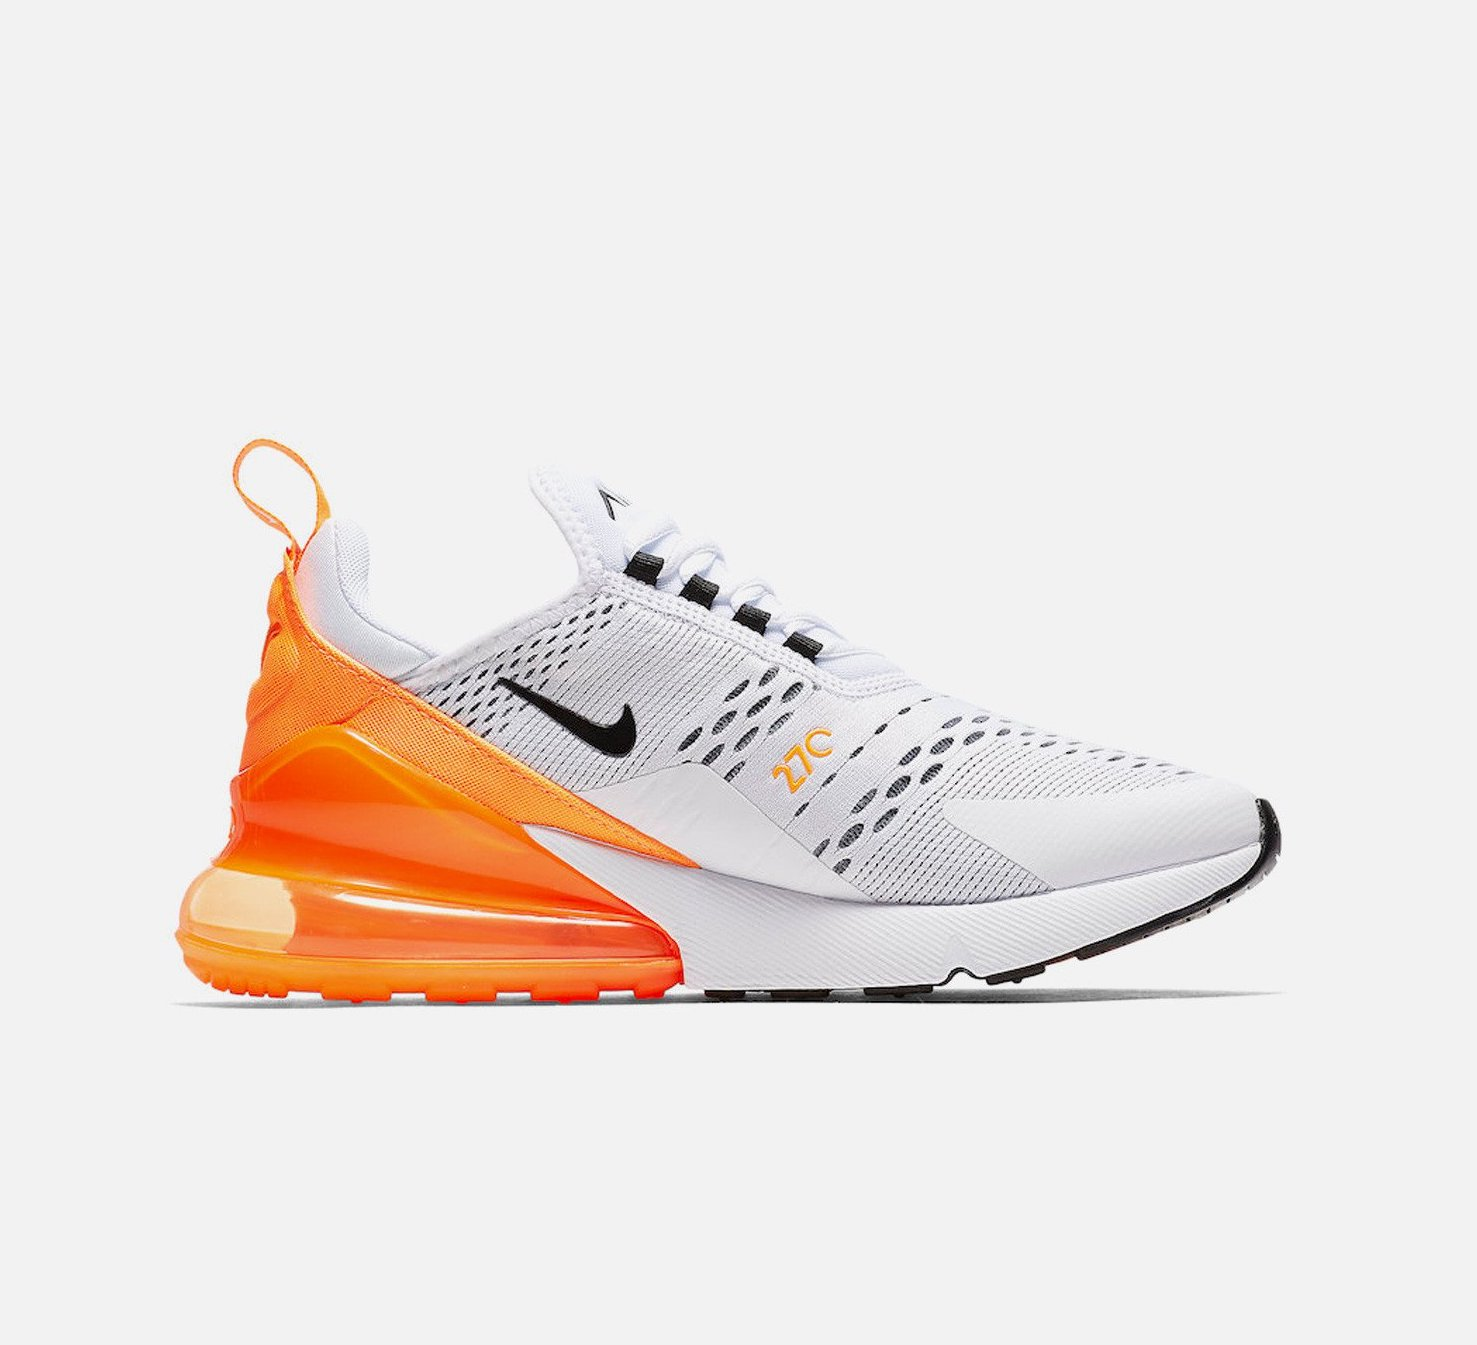 nike air max 270 just do it orange